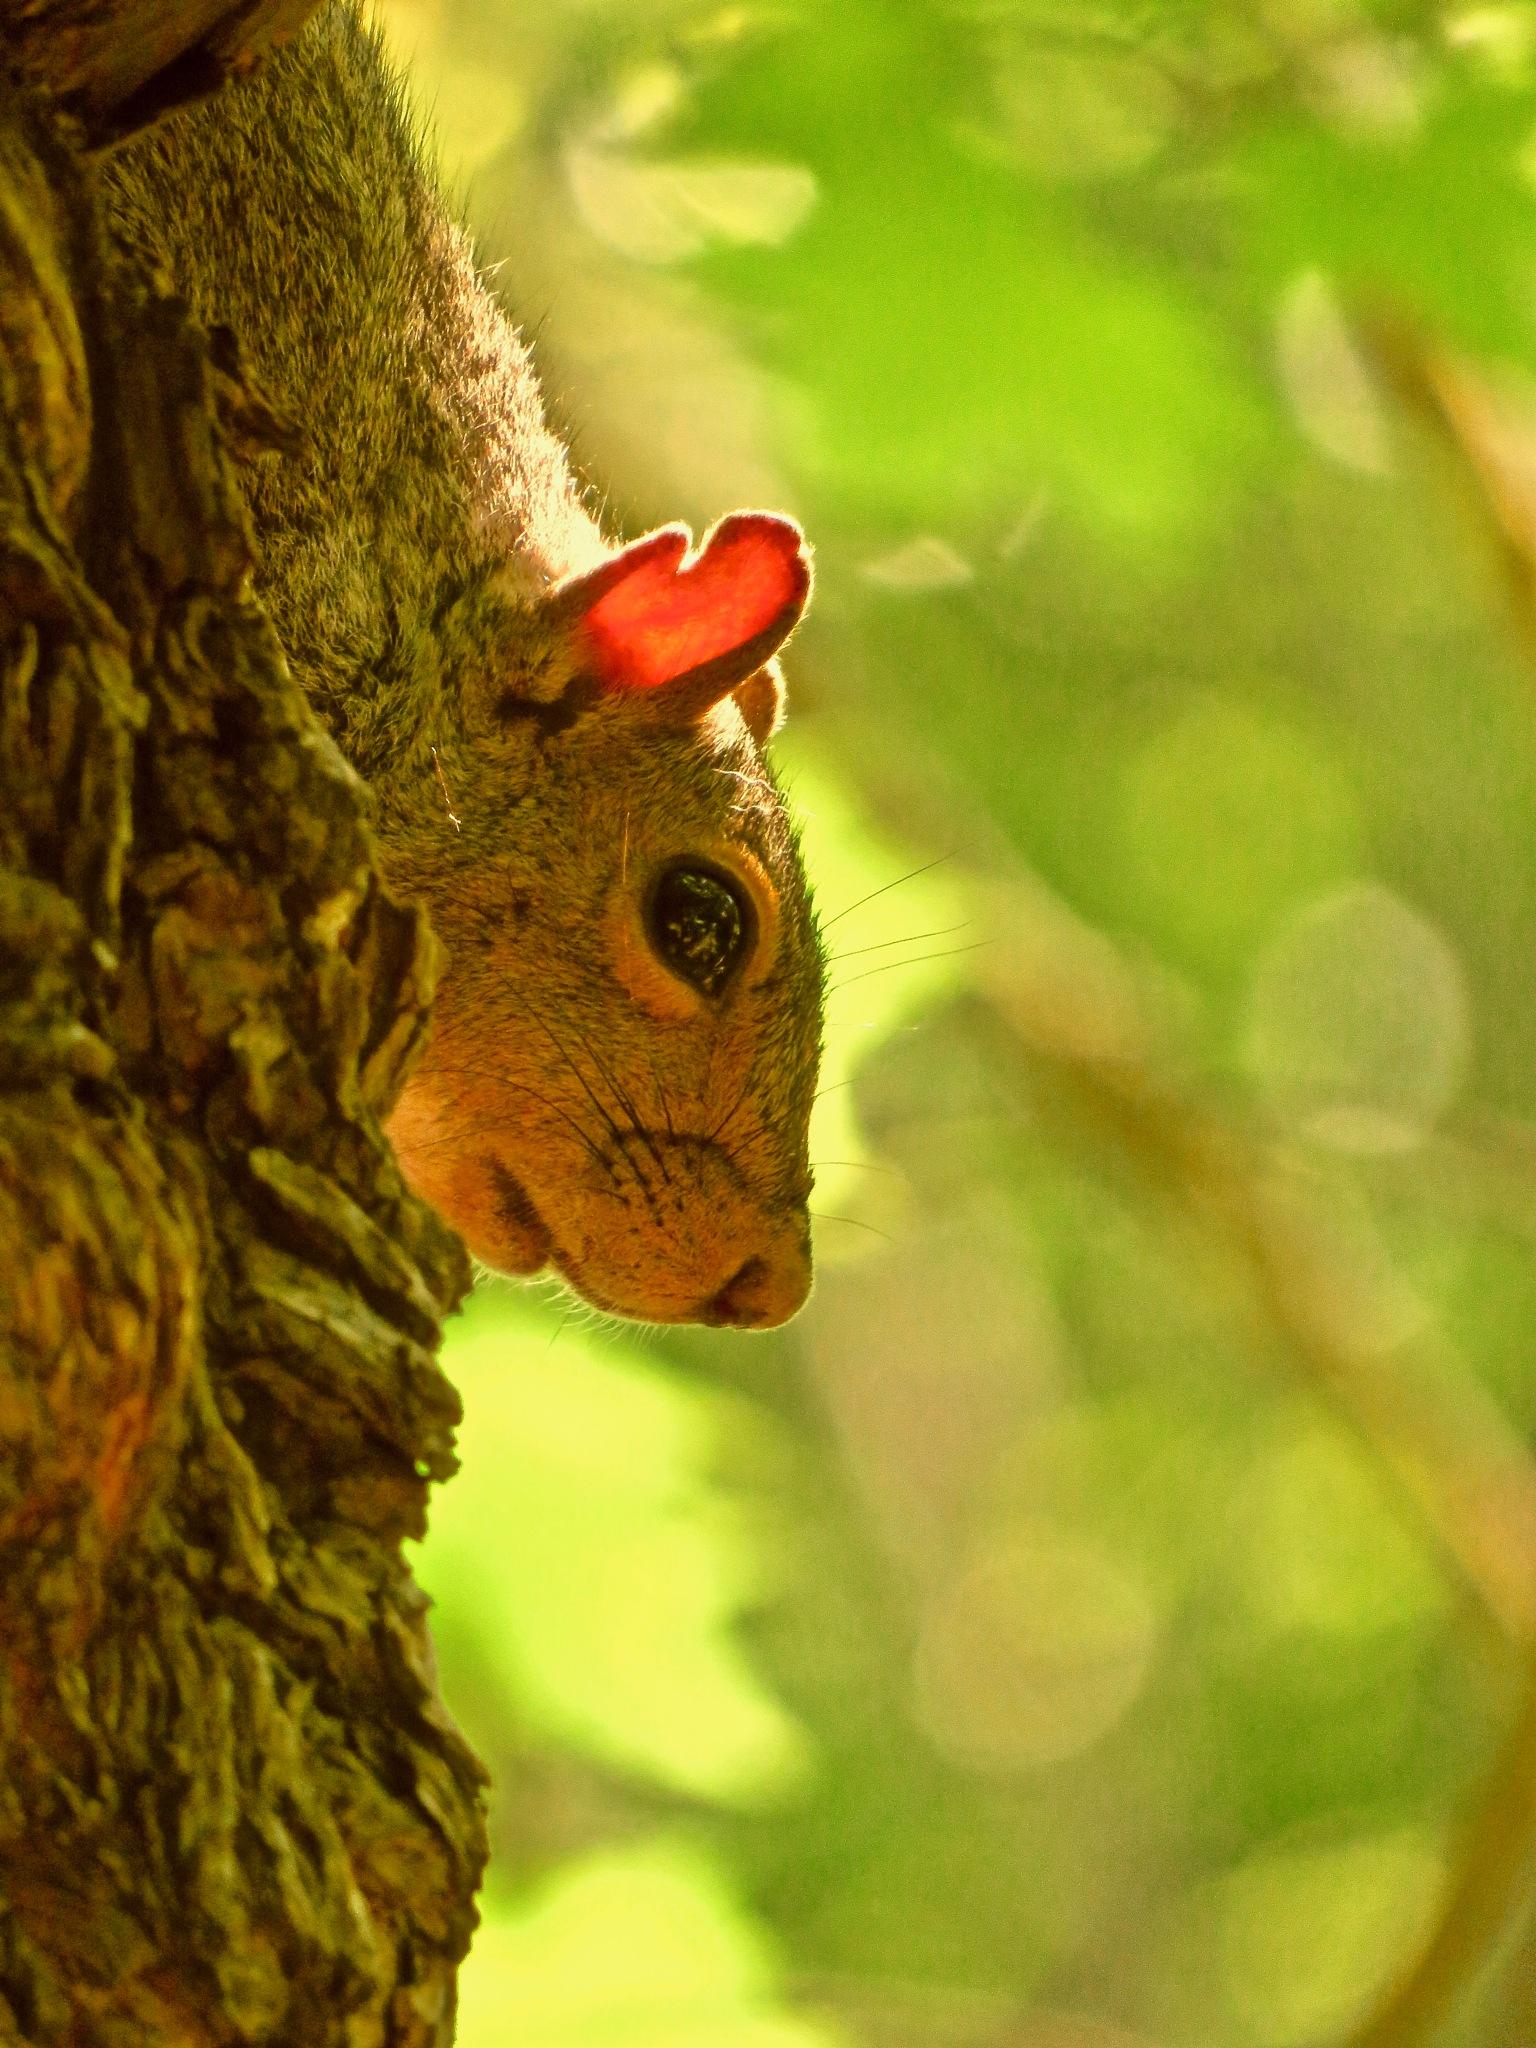 wot no nuts ?? .... oh futz by David Devion